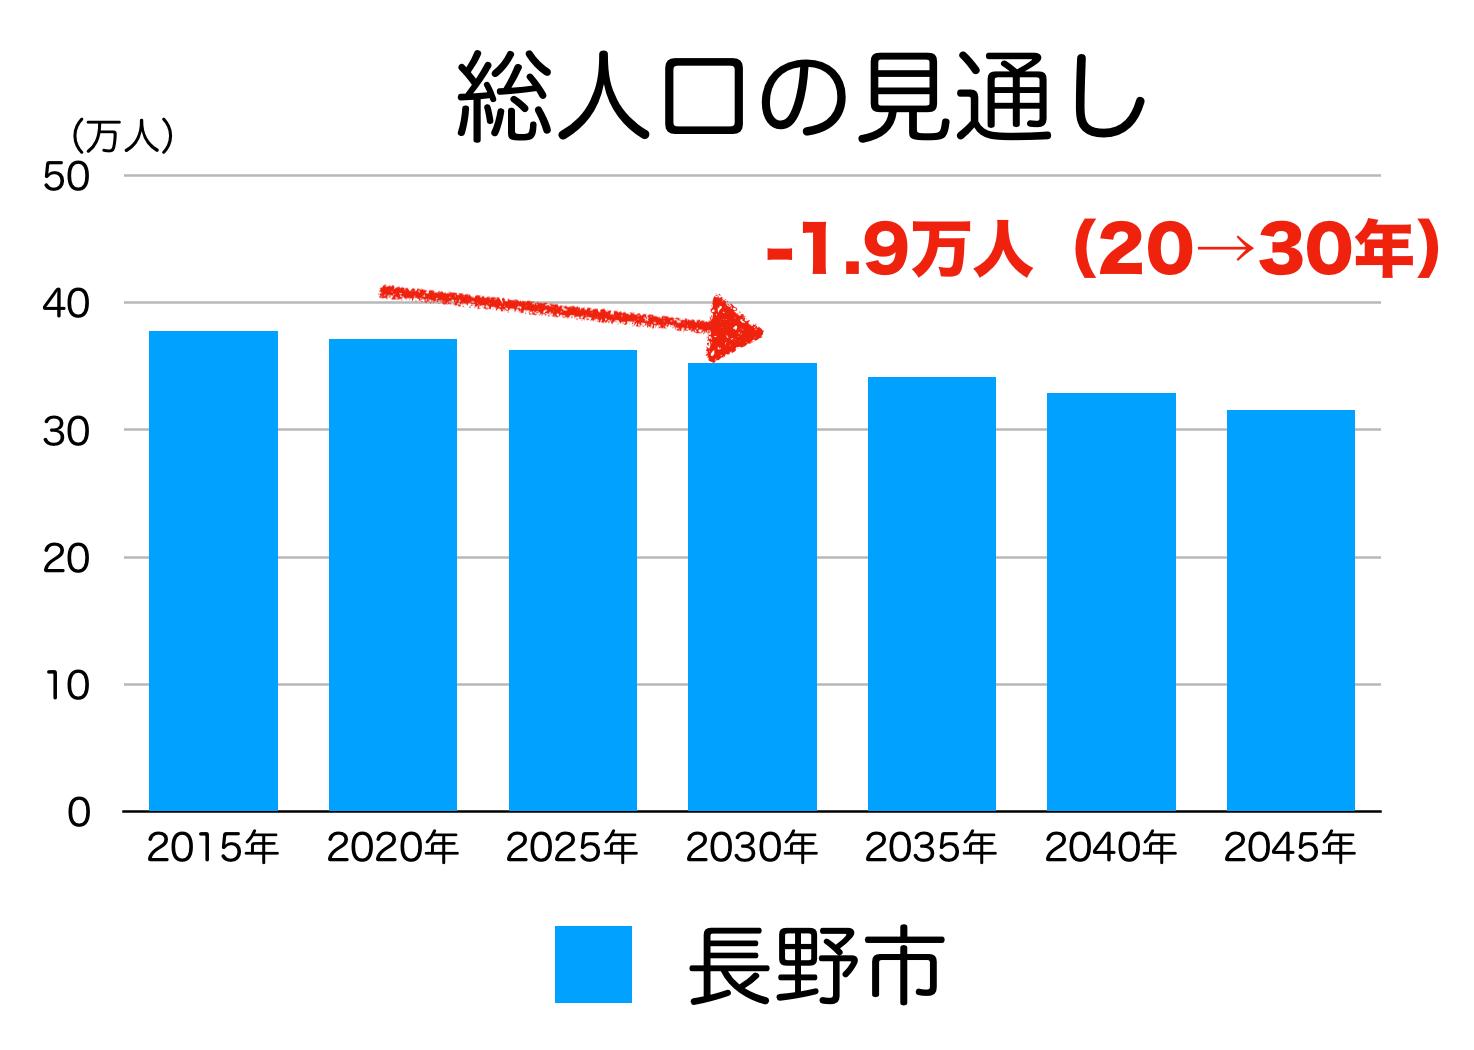 長野市の人口予測